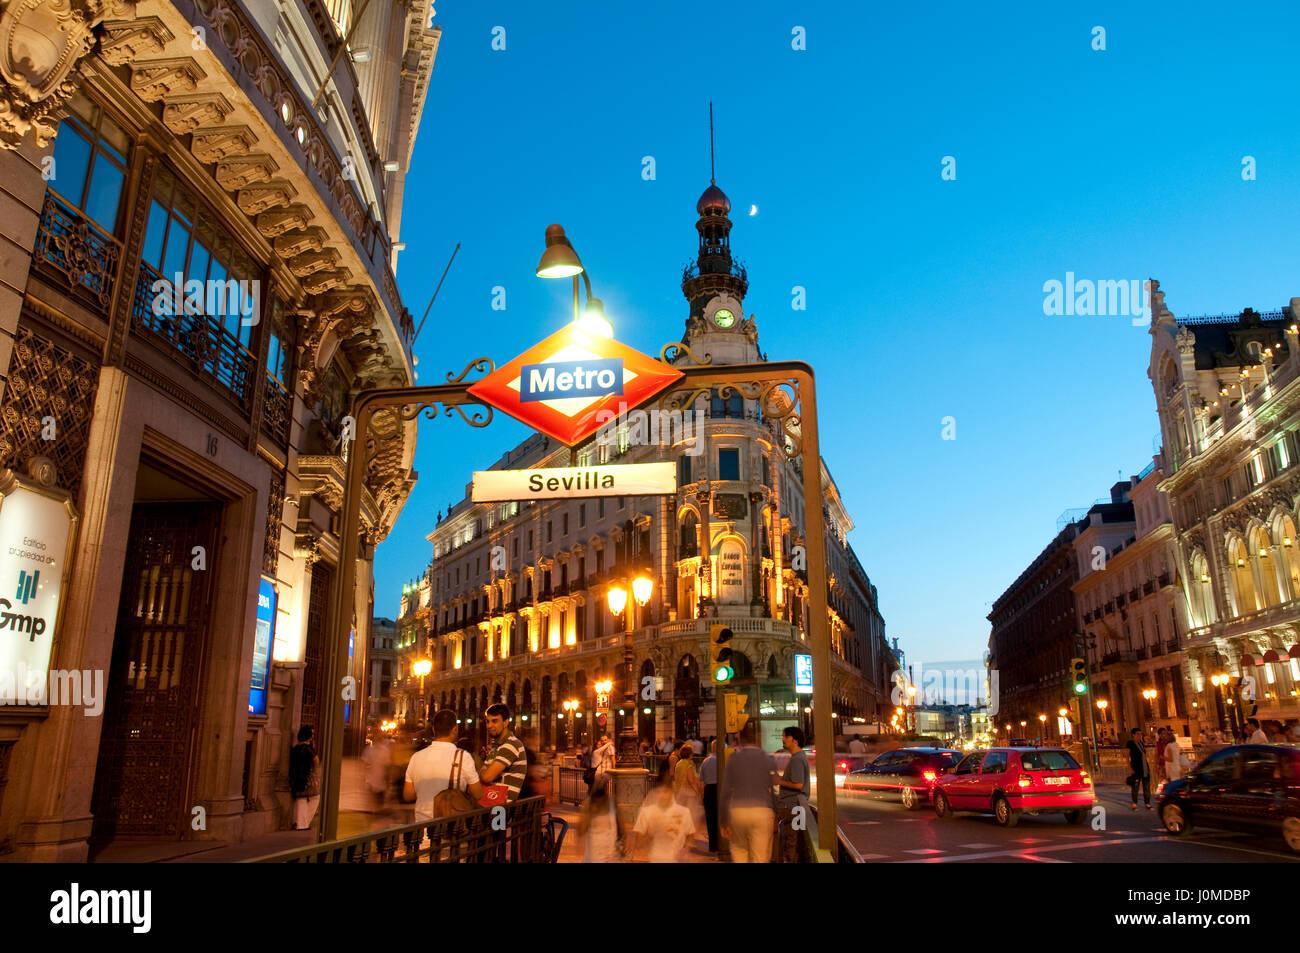 Metro Sevilla entrance, night view. Madrid, Spain. - Stock Image